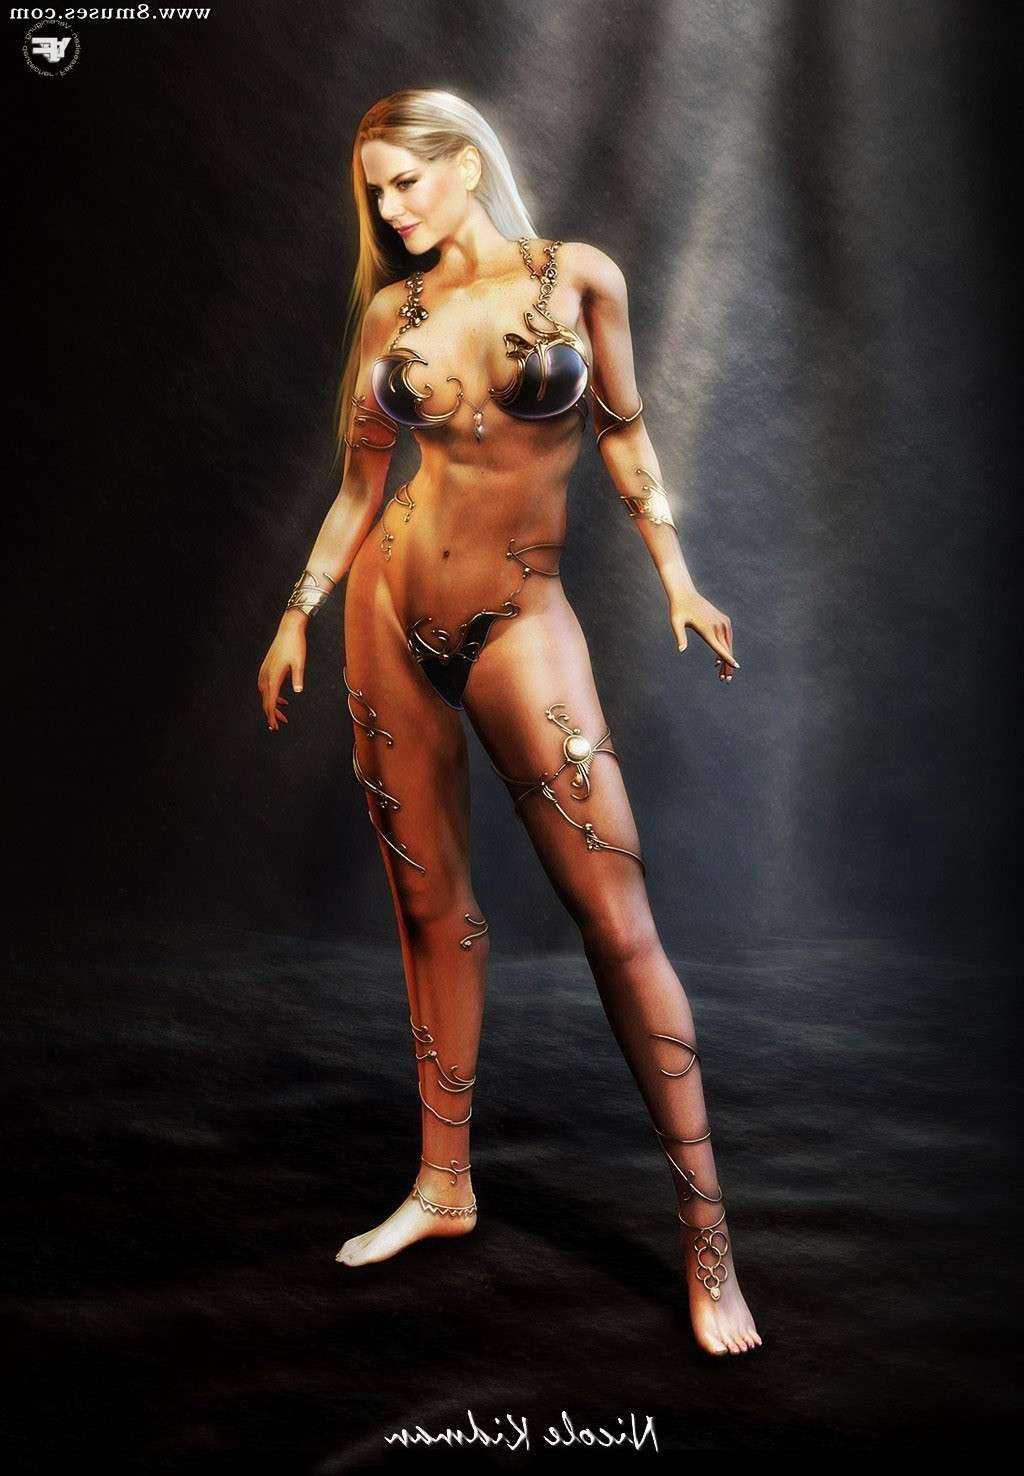 Fake-Celebrities-Sex-Pictures/Nicole-Kidman Nicole_Kidman__8muses_-_Sex_and_Porn_Comics_639.jpg